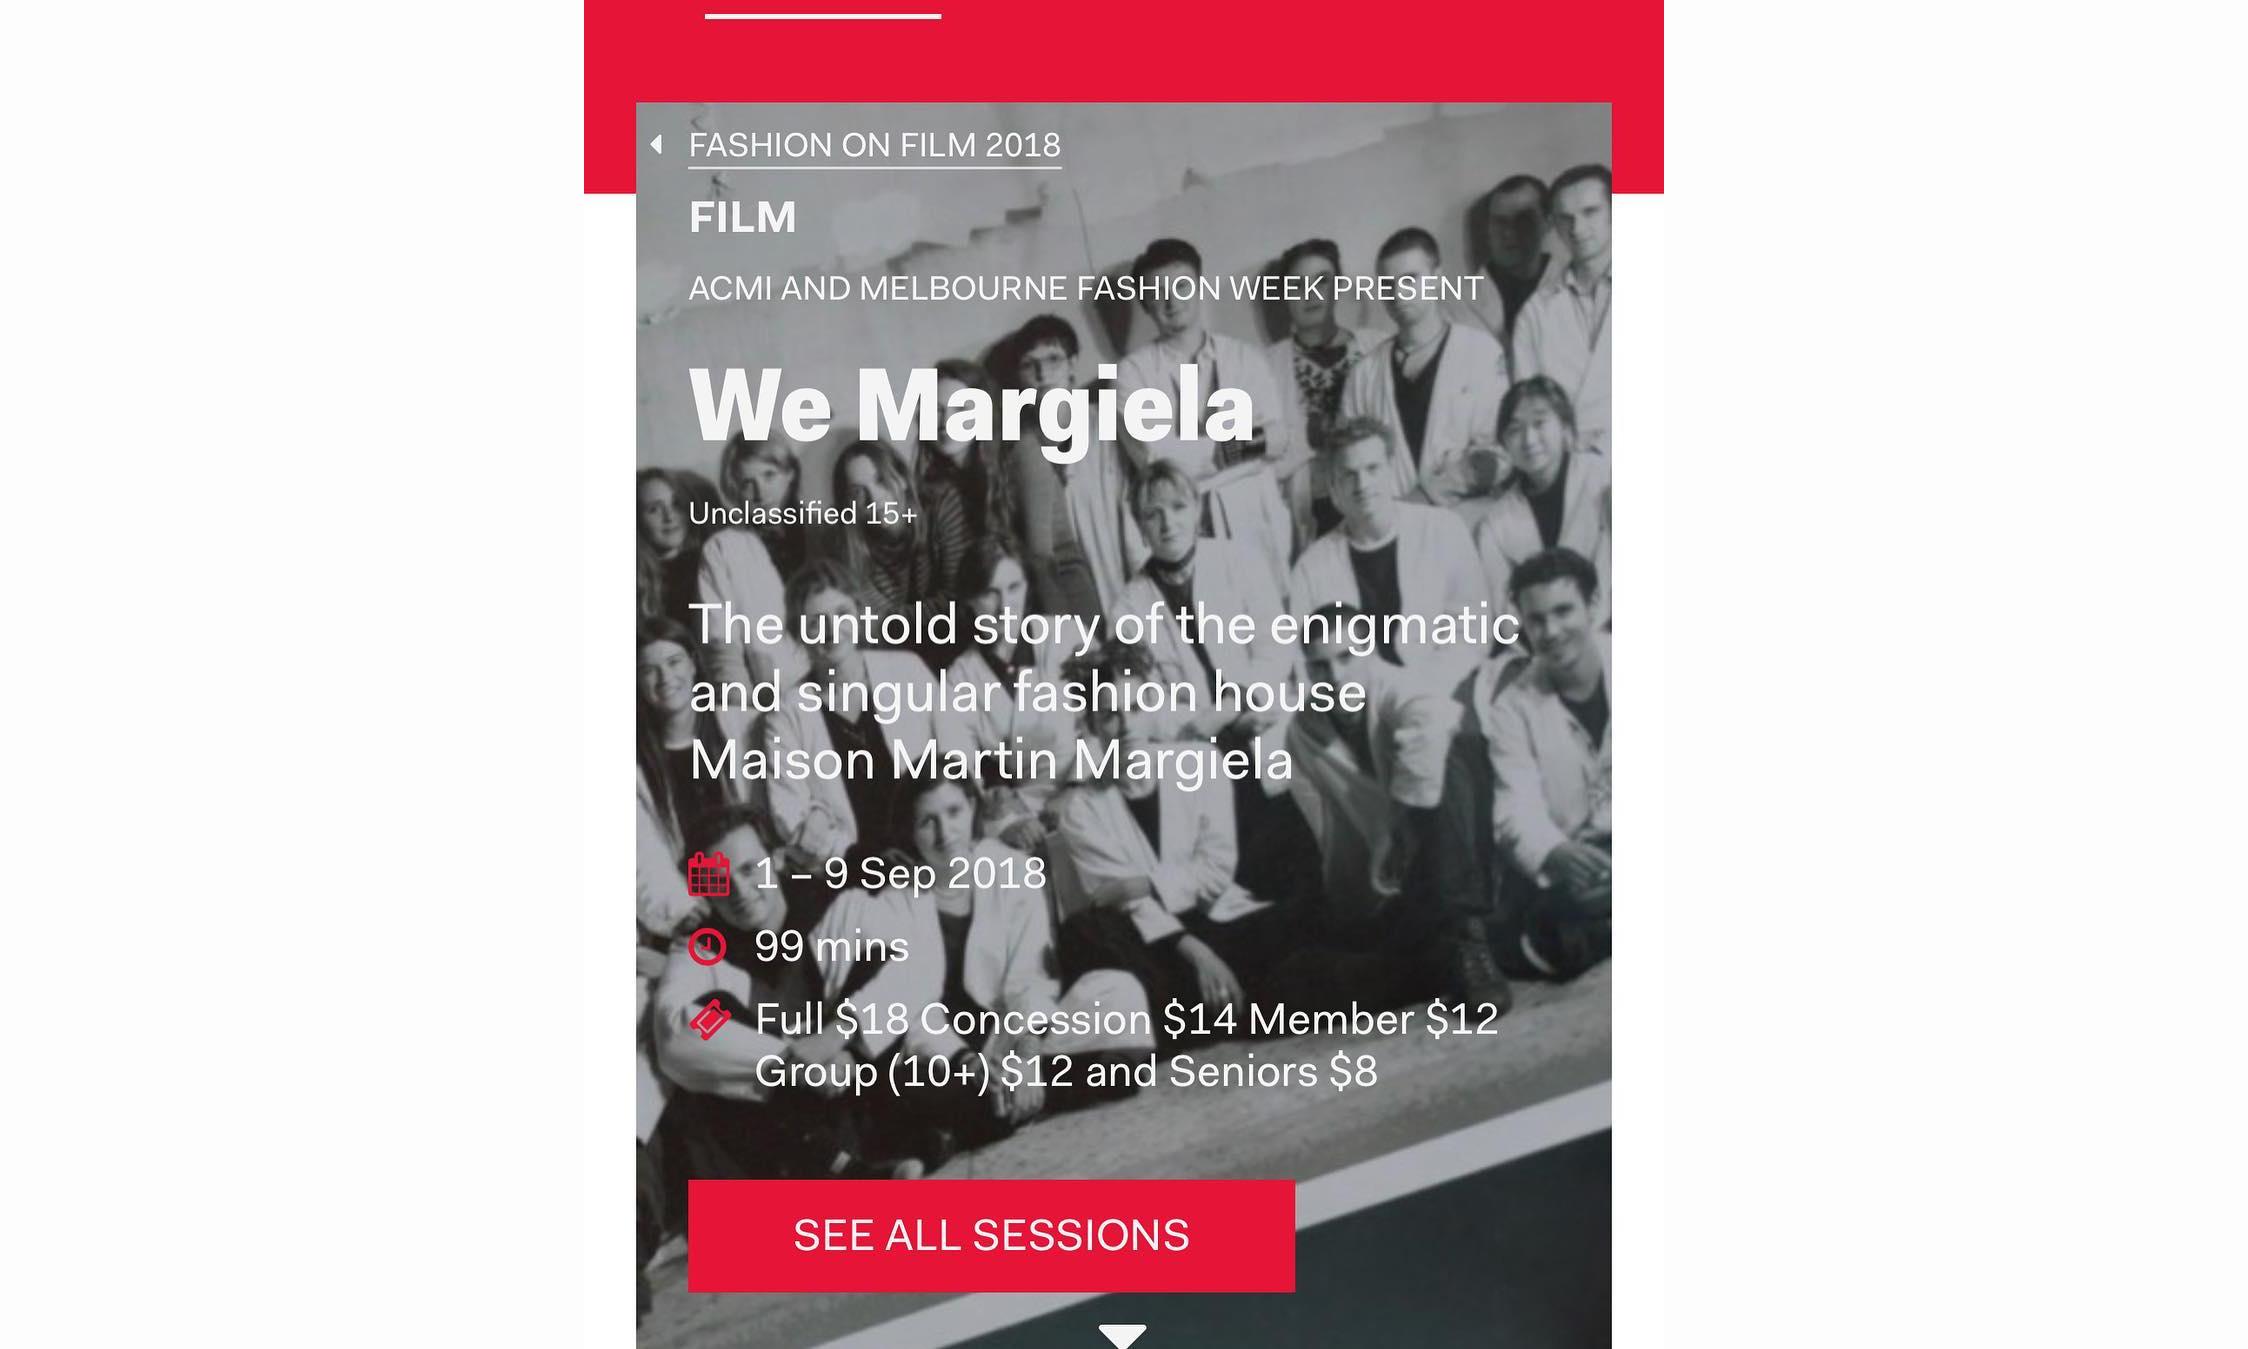 《We Margiela》即将于 9 月在墨尔本时装周上映